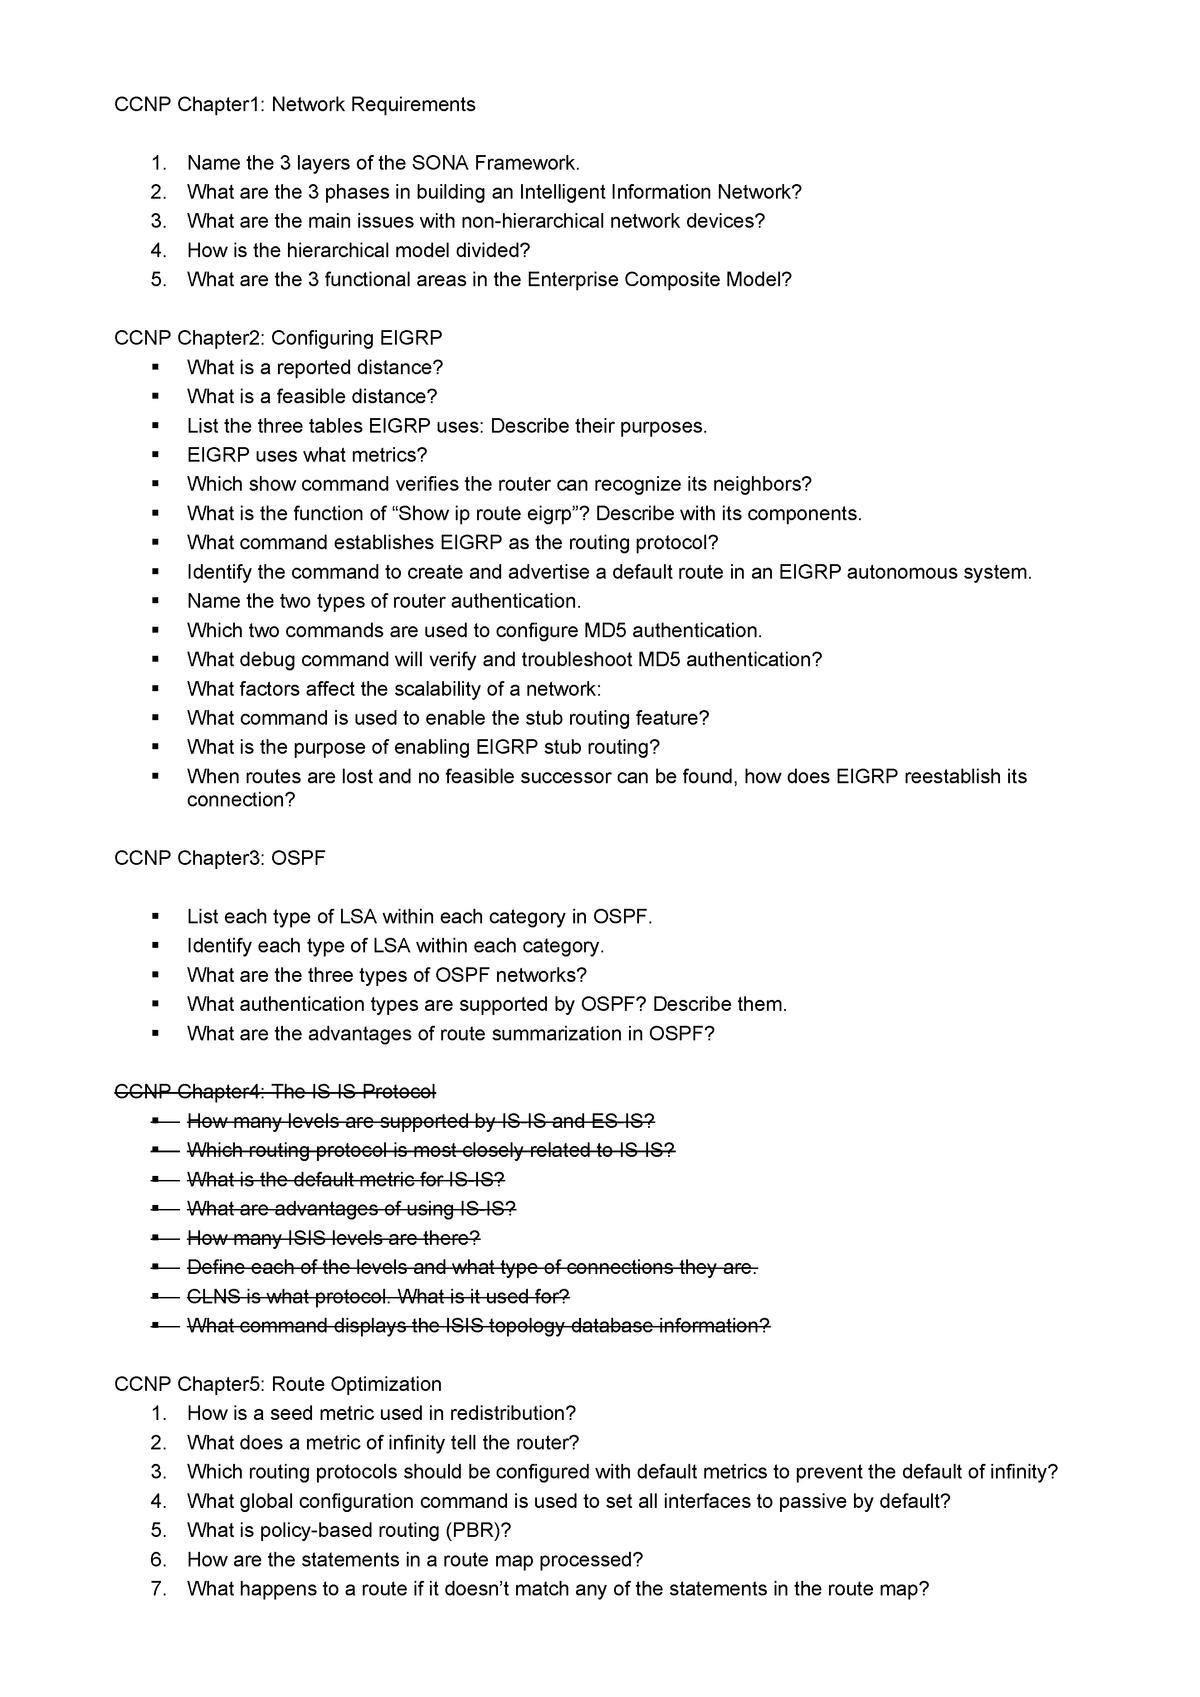 CCNP sample written exam questions - EEET2326: Scalable Internet